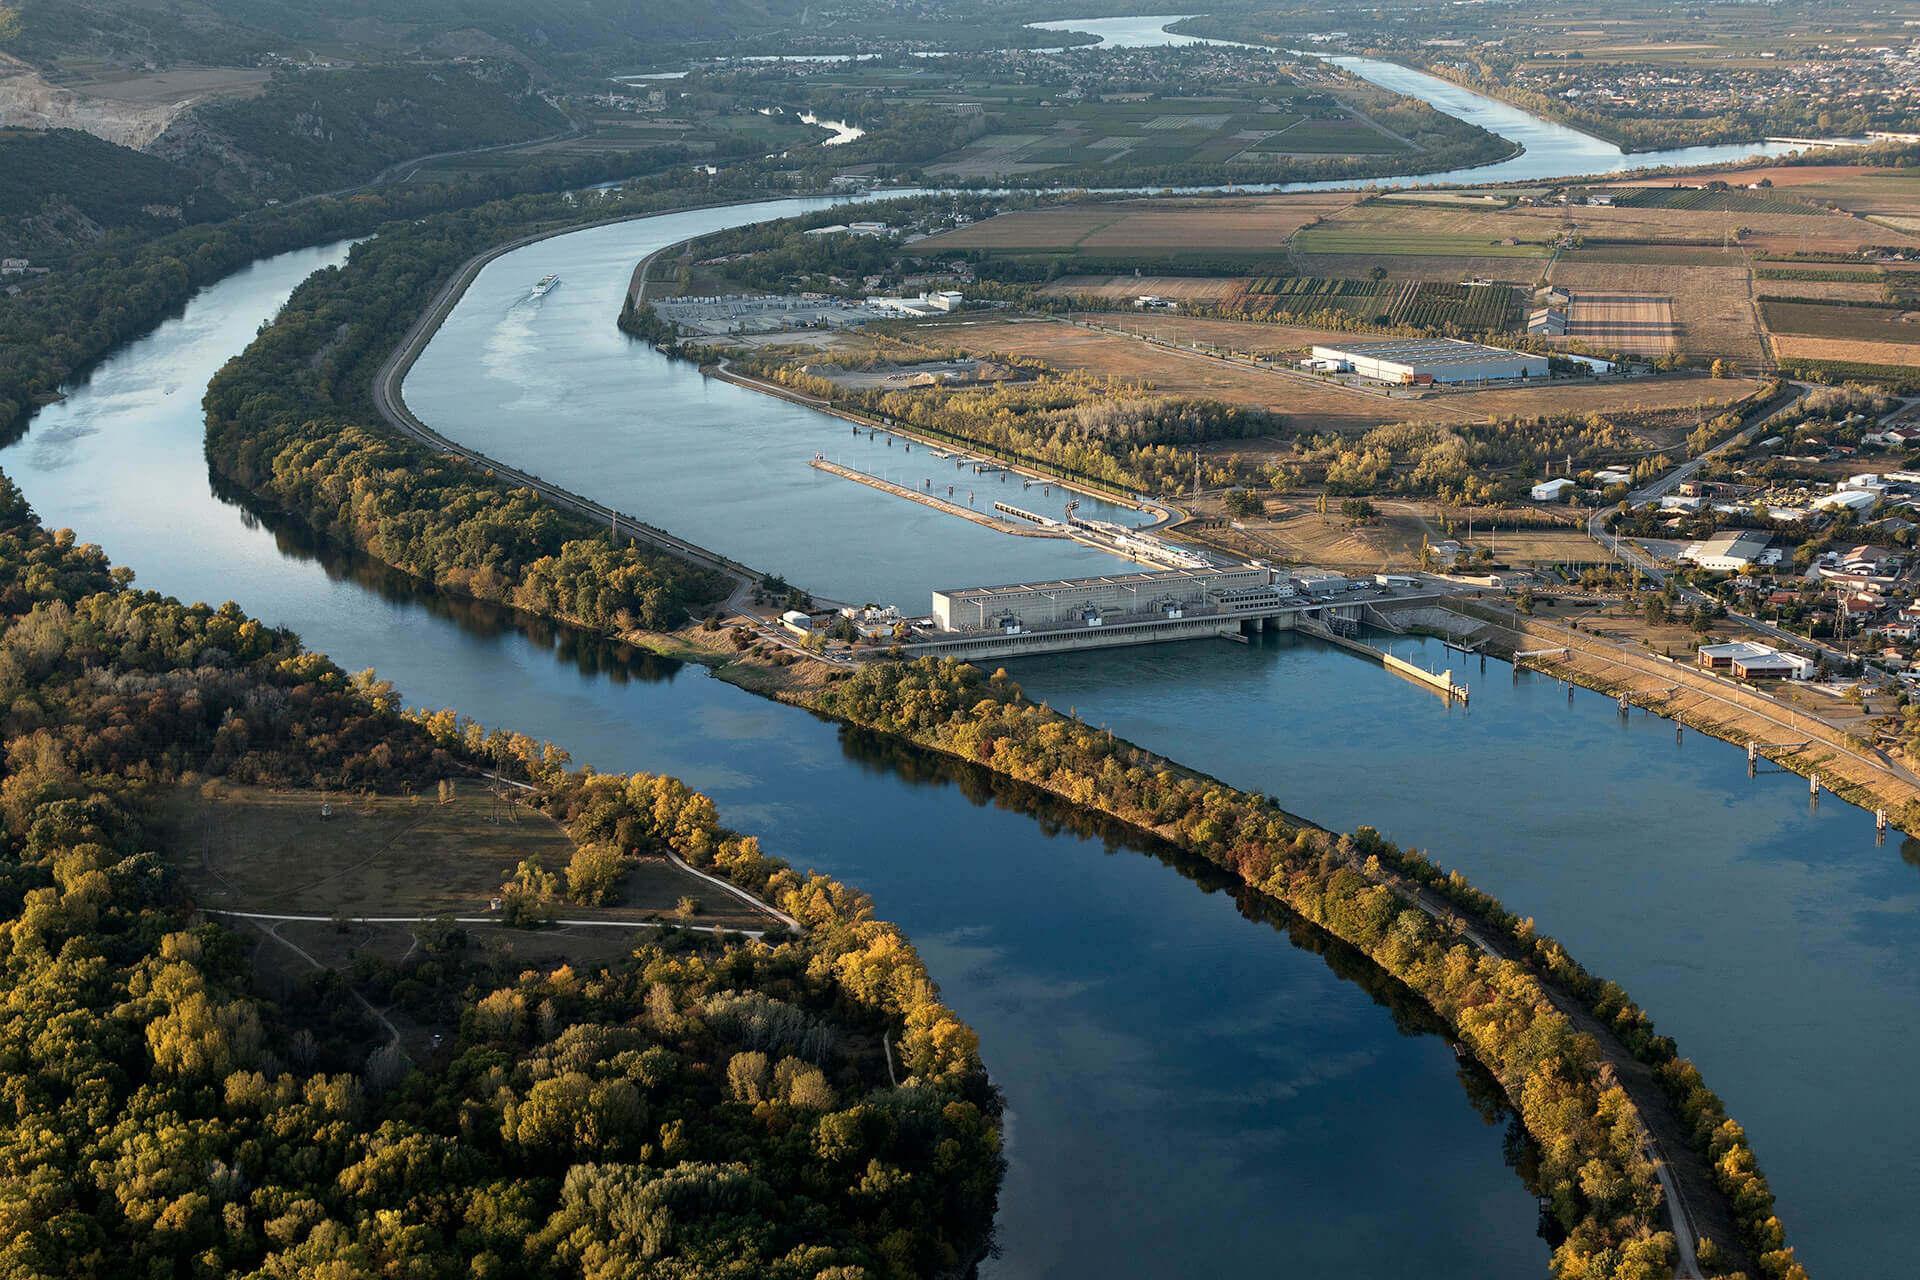 Le fleuve Rhône, Km 550 Ardèche Cornas, Drôme Bourg-lès-Valence